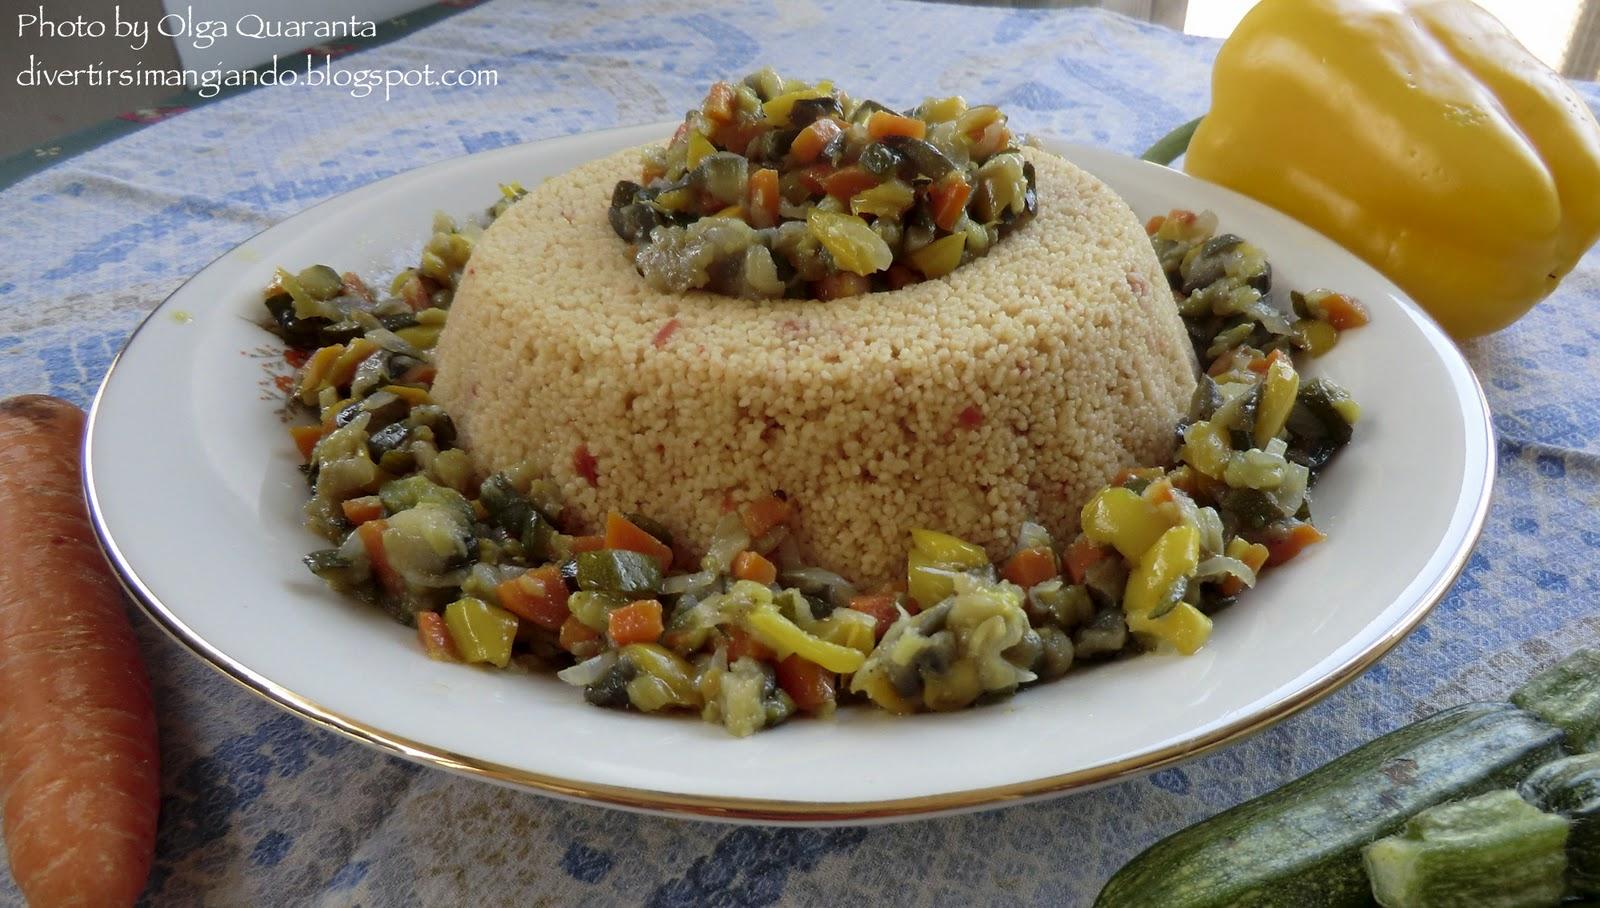 Divertirsi mangiando cous cous vegetariano for Cucinare vegetariano